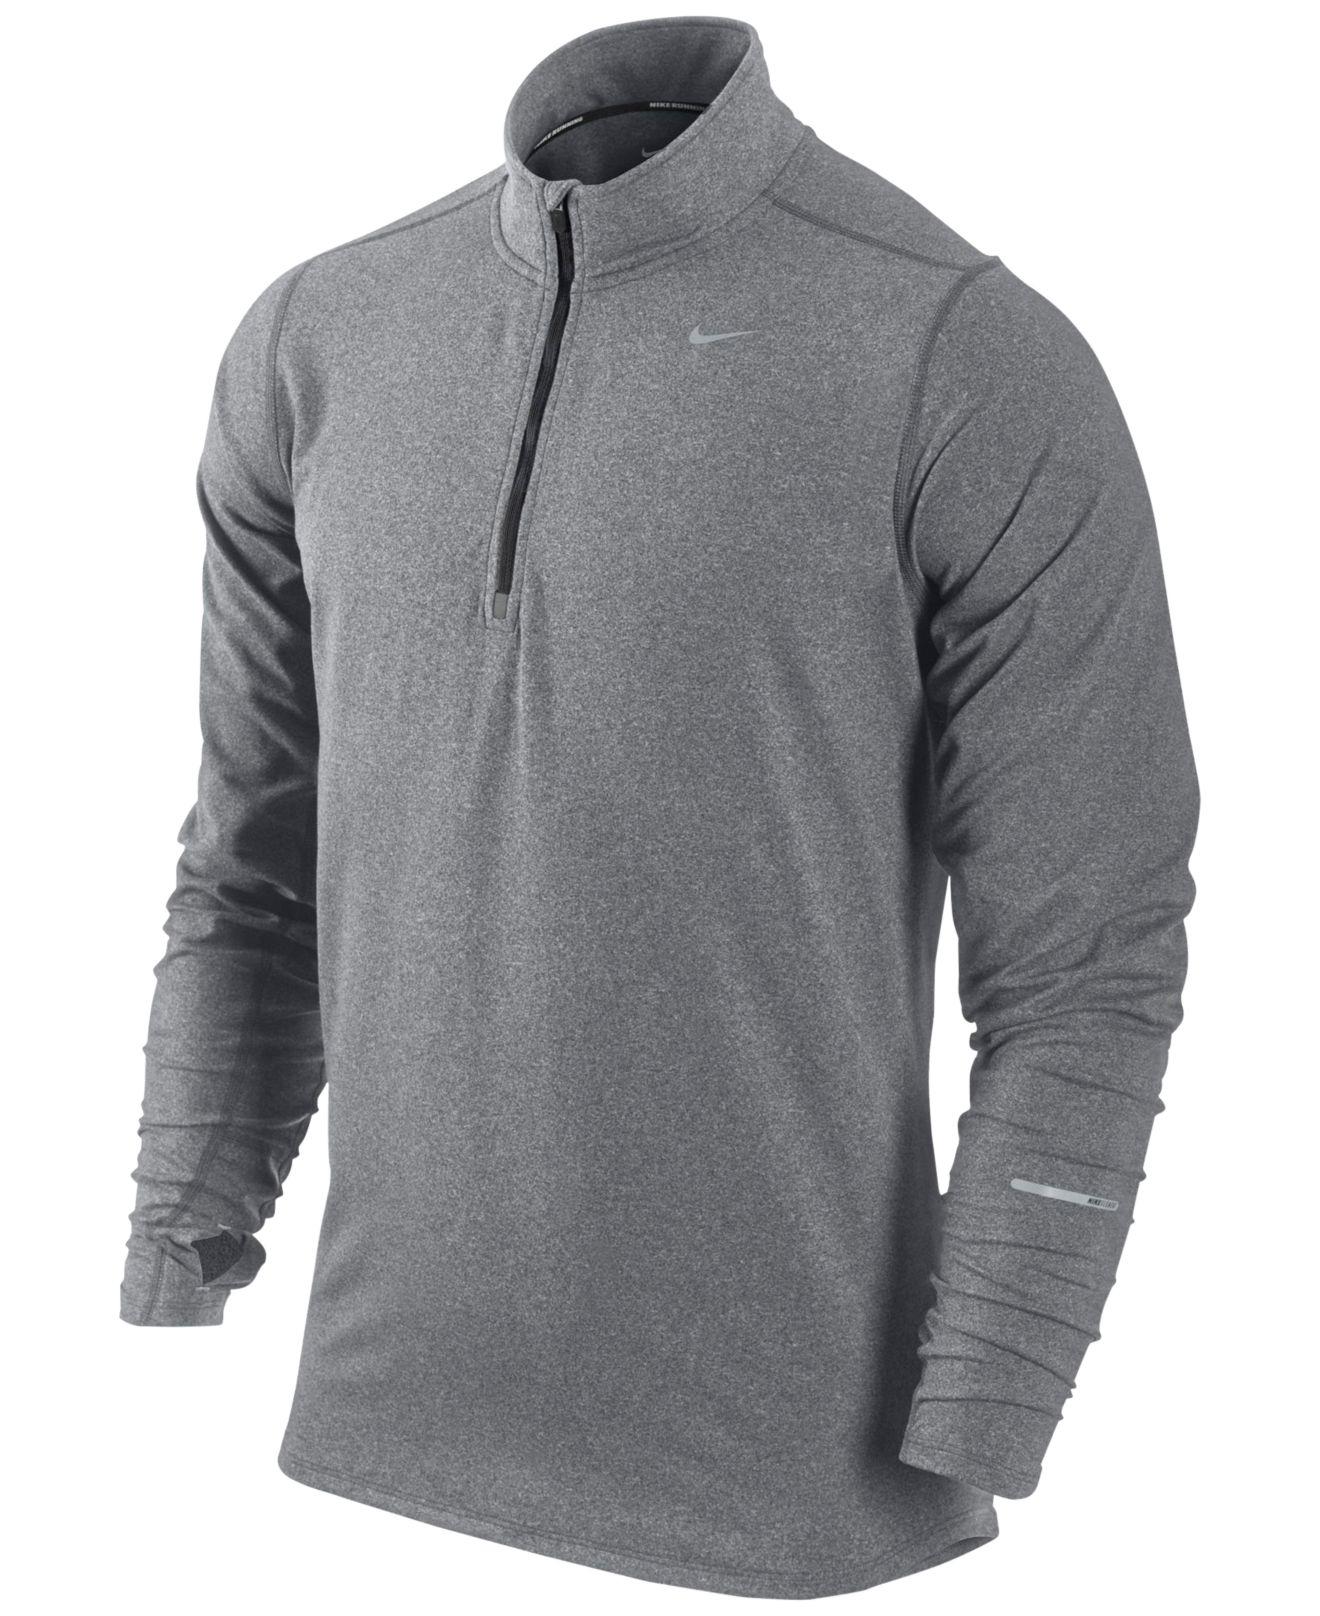 Mens Clothing Element